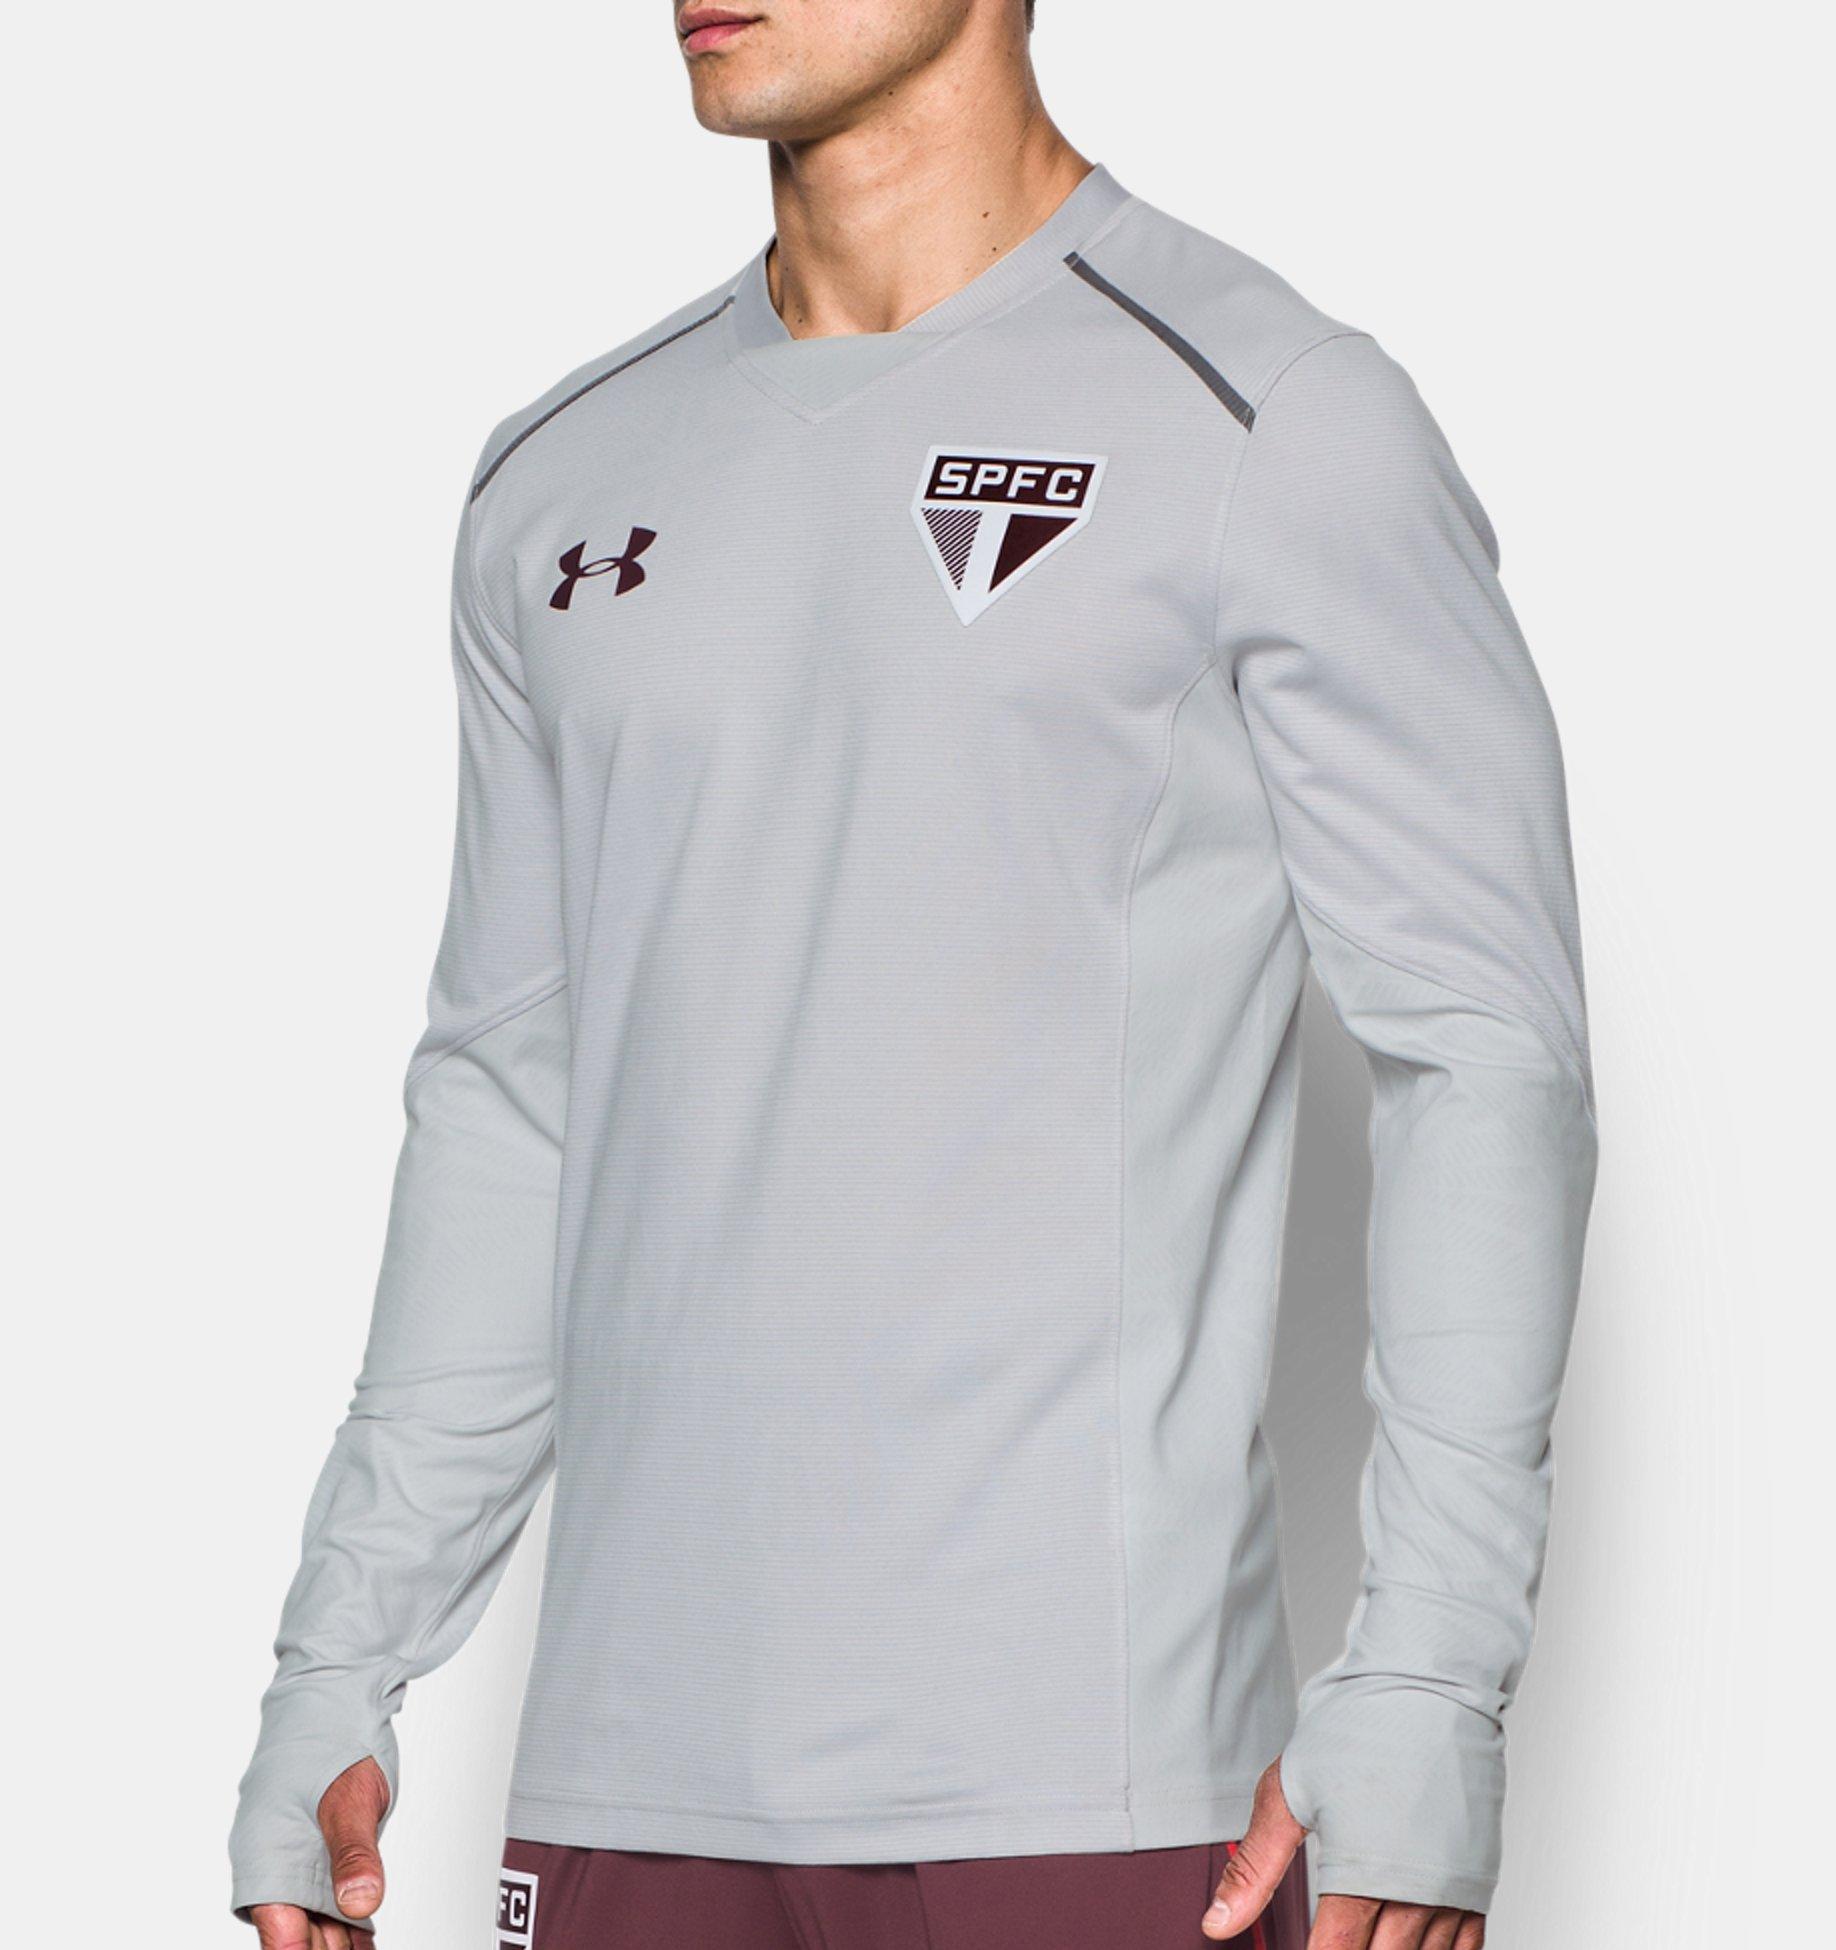 66b8d24eeb ... Camisa Manga Longa Treino São Paulo - Masculina ...